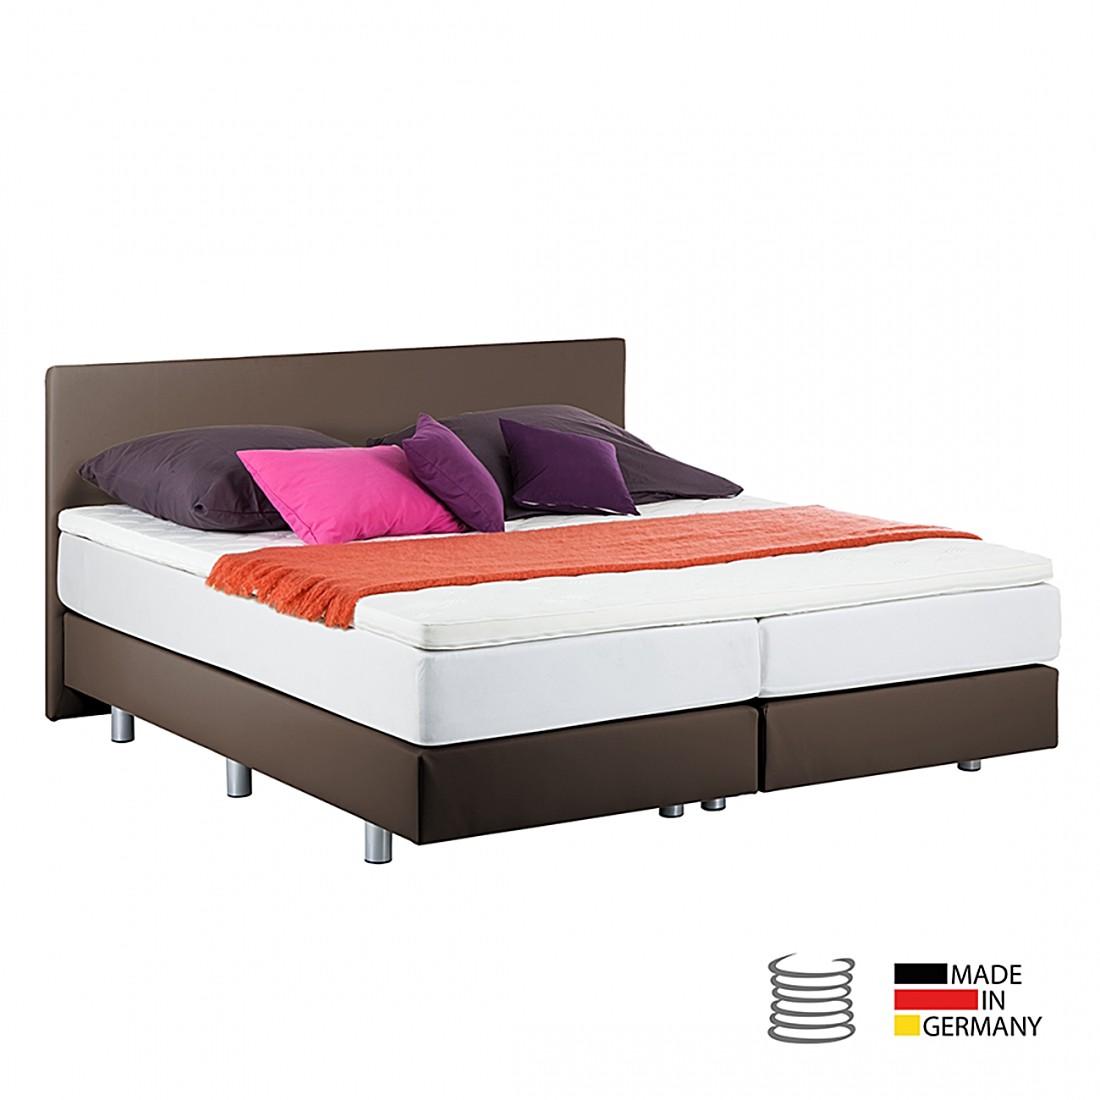 boxspringbett ramona inklusive topper kunstleder 140 x 200cm braun breckle g nstig. Black Bedroom Furniture Sets. Home Design Ideas